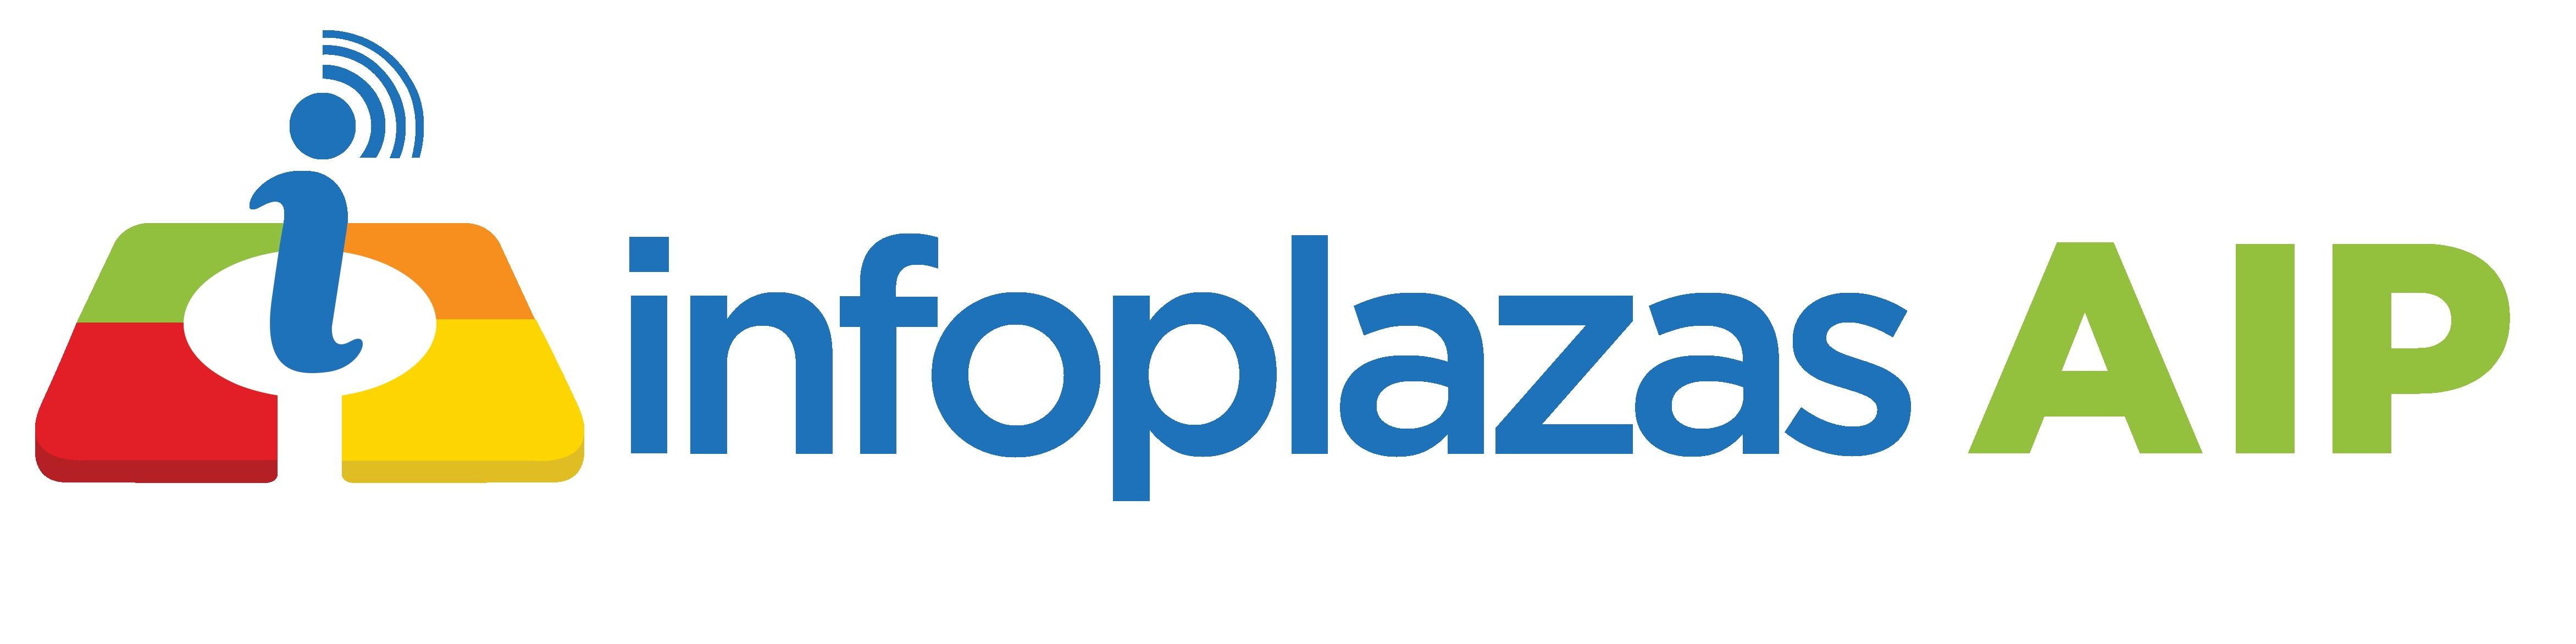 infoplazas_horizontal-infoplazas-aip